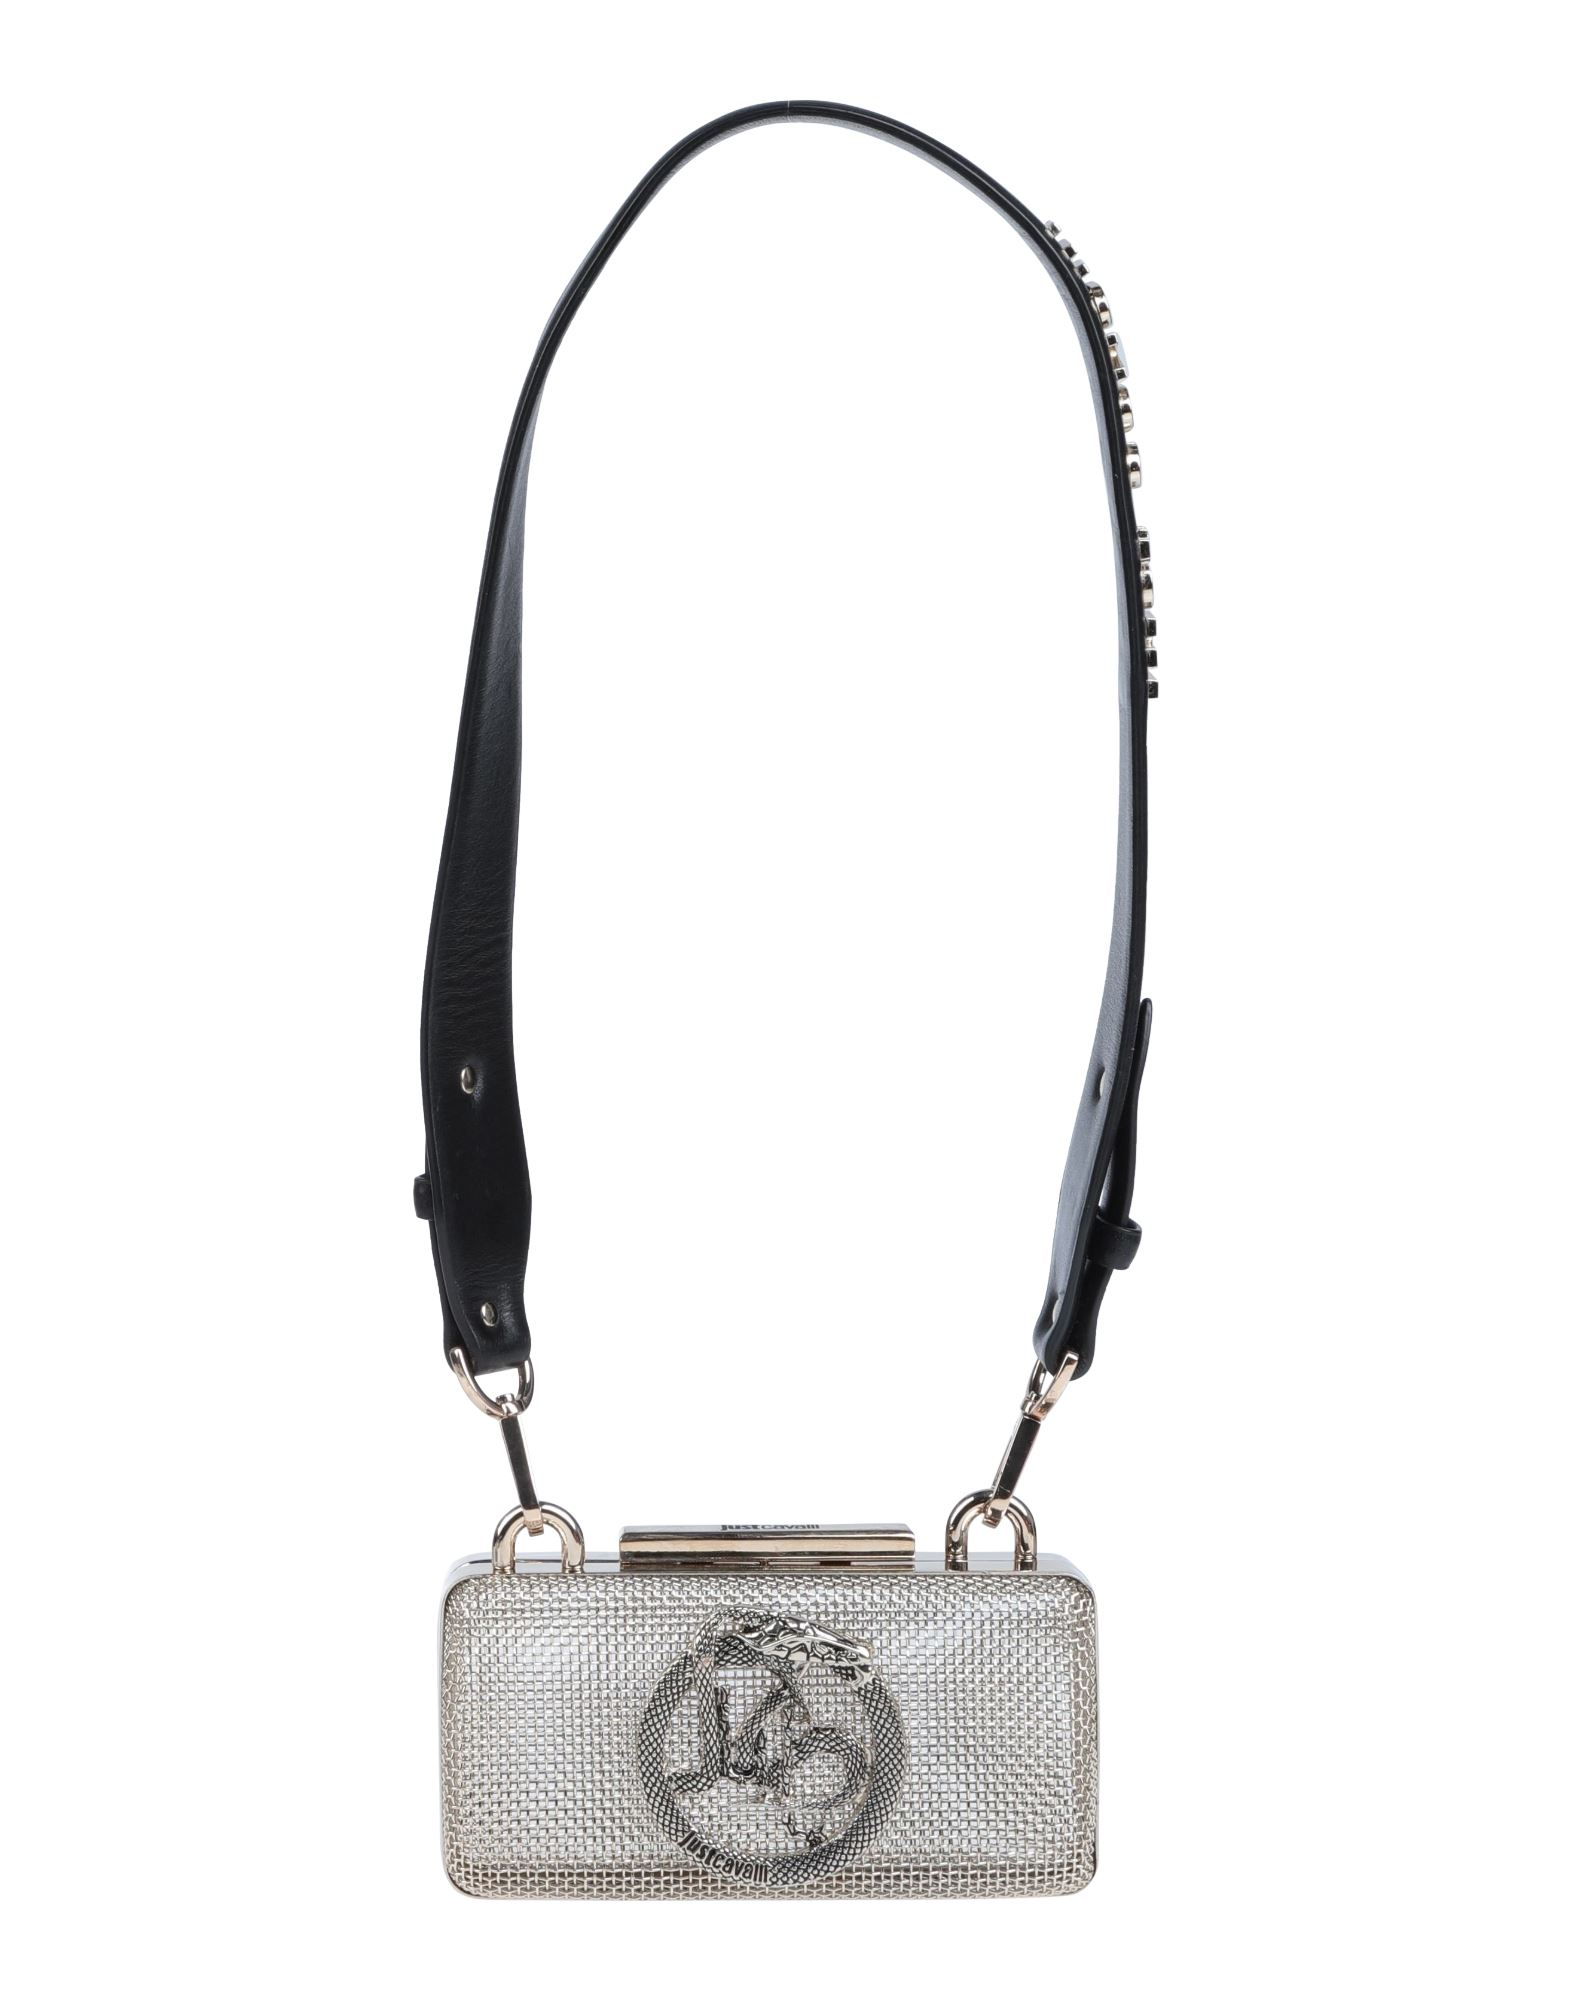 JUST CAVALLI Shoulder bags - Item 45556023